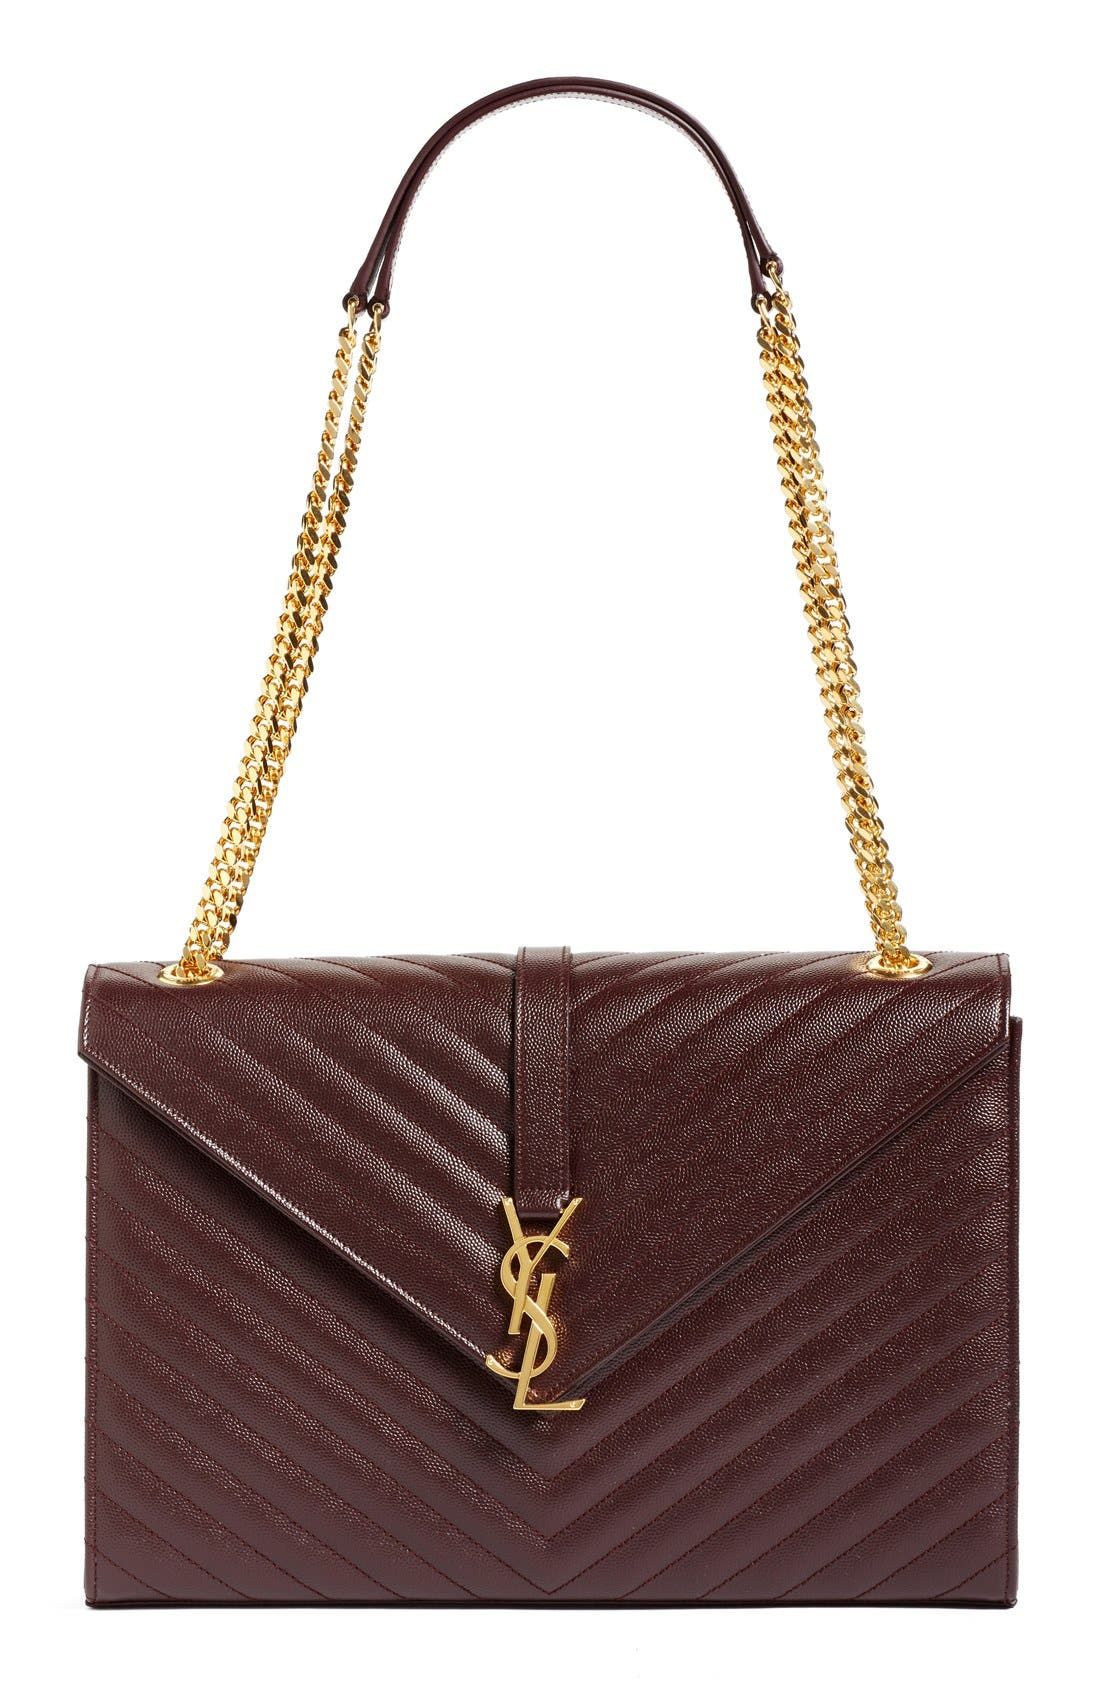 Saint Laurent 'Large Monogram' Grained Leather Shoulder Bag